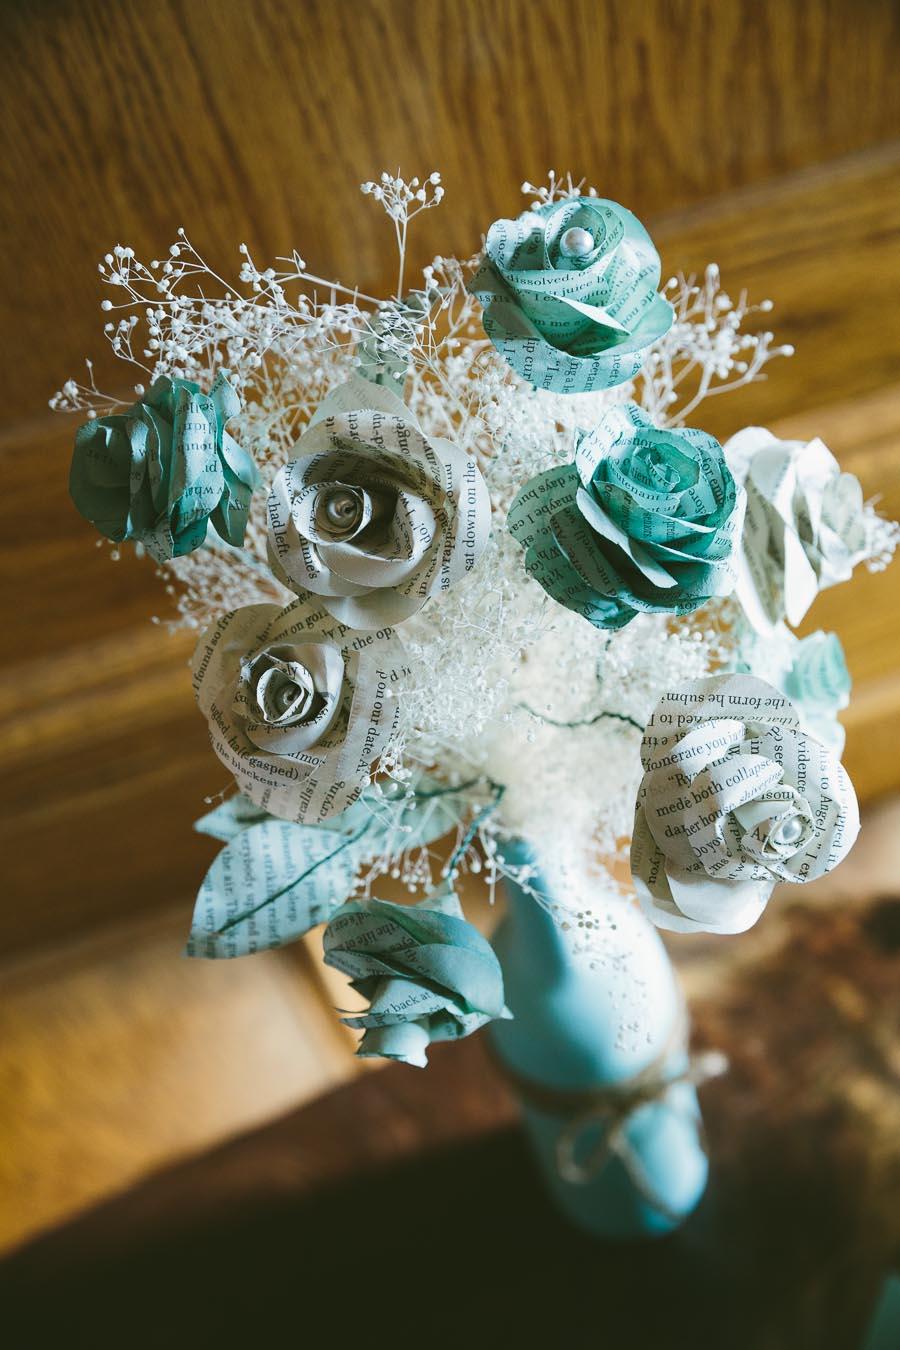 north-olmstead-wedding-photography-at-rubys-grafton-132.jpg